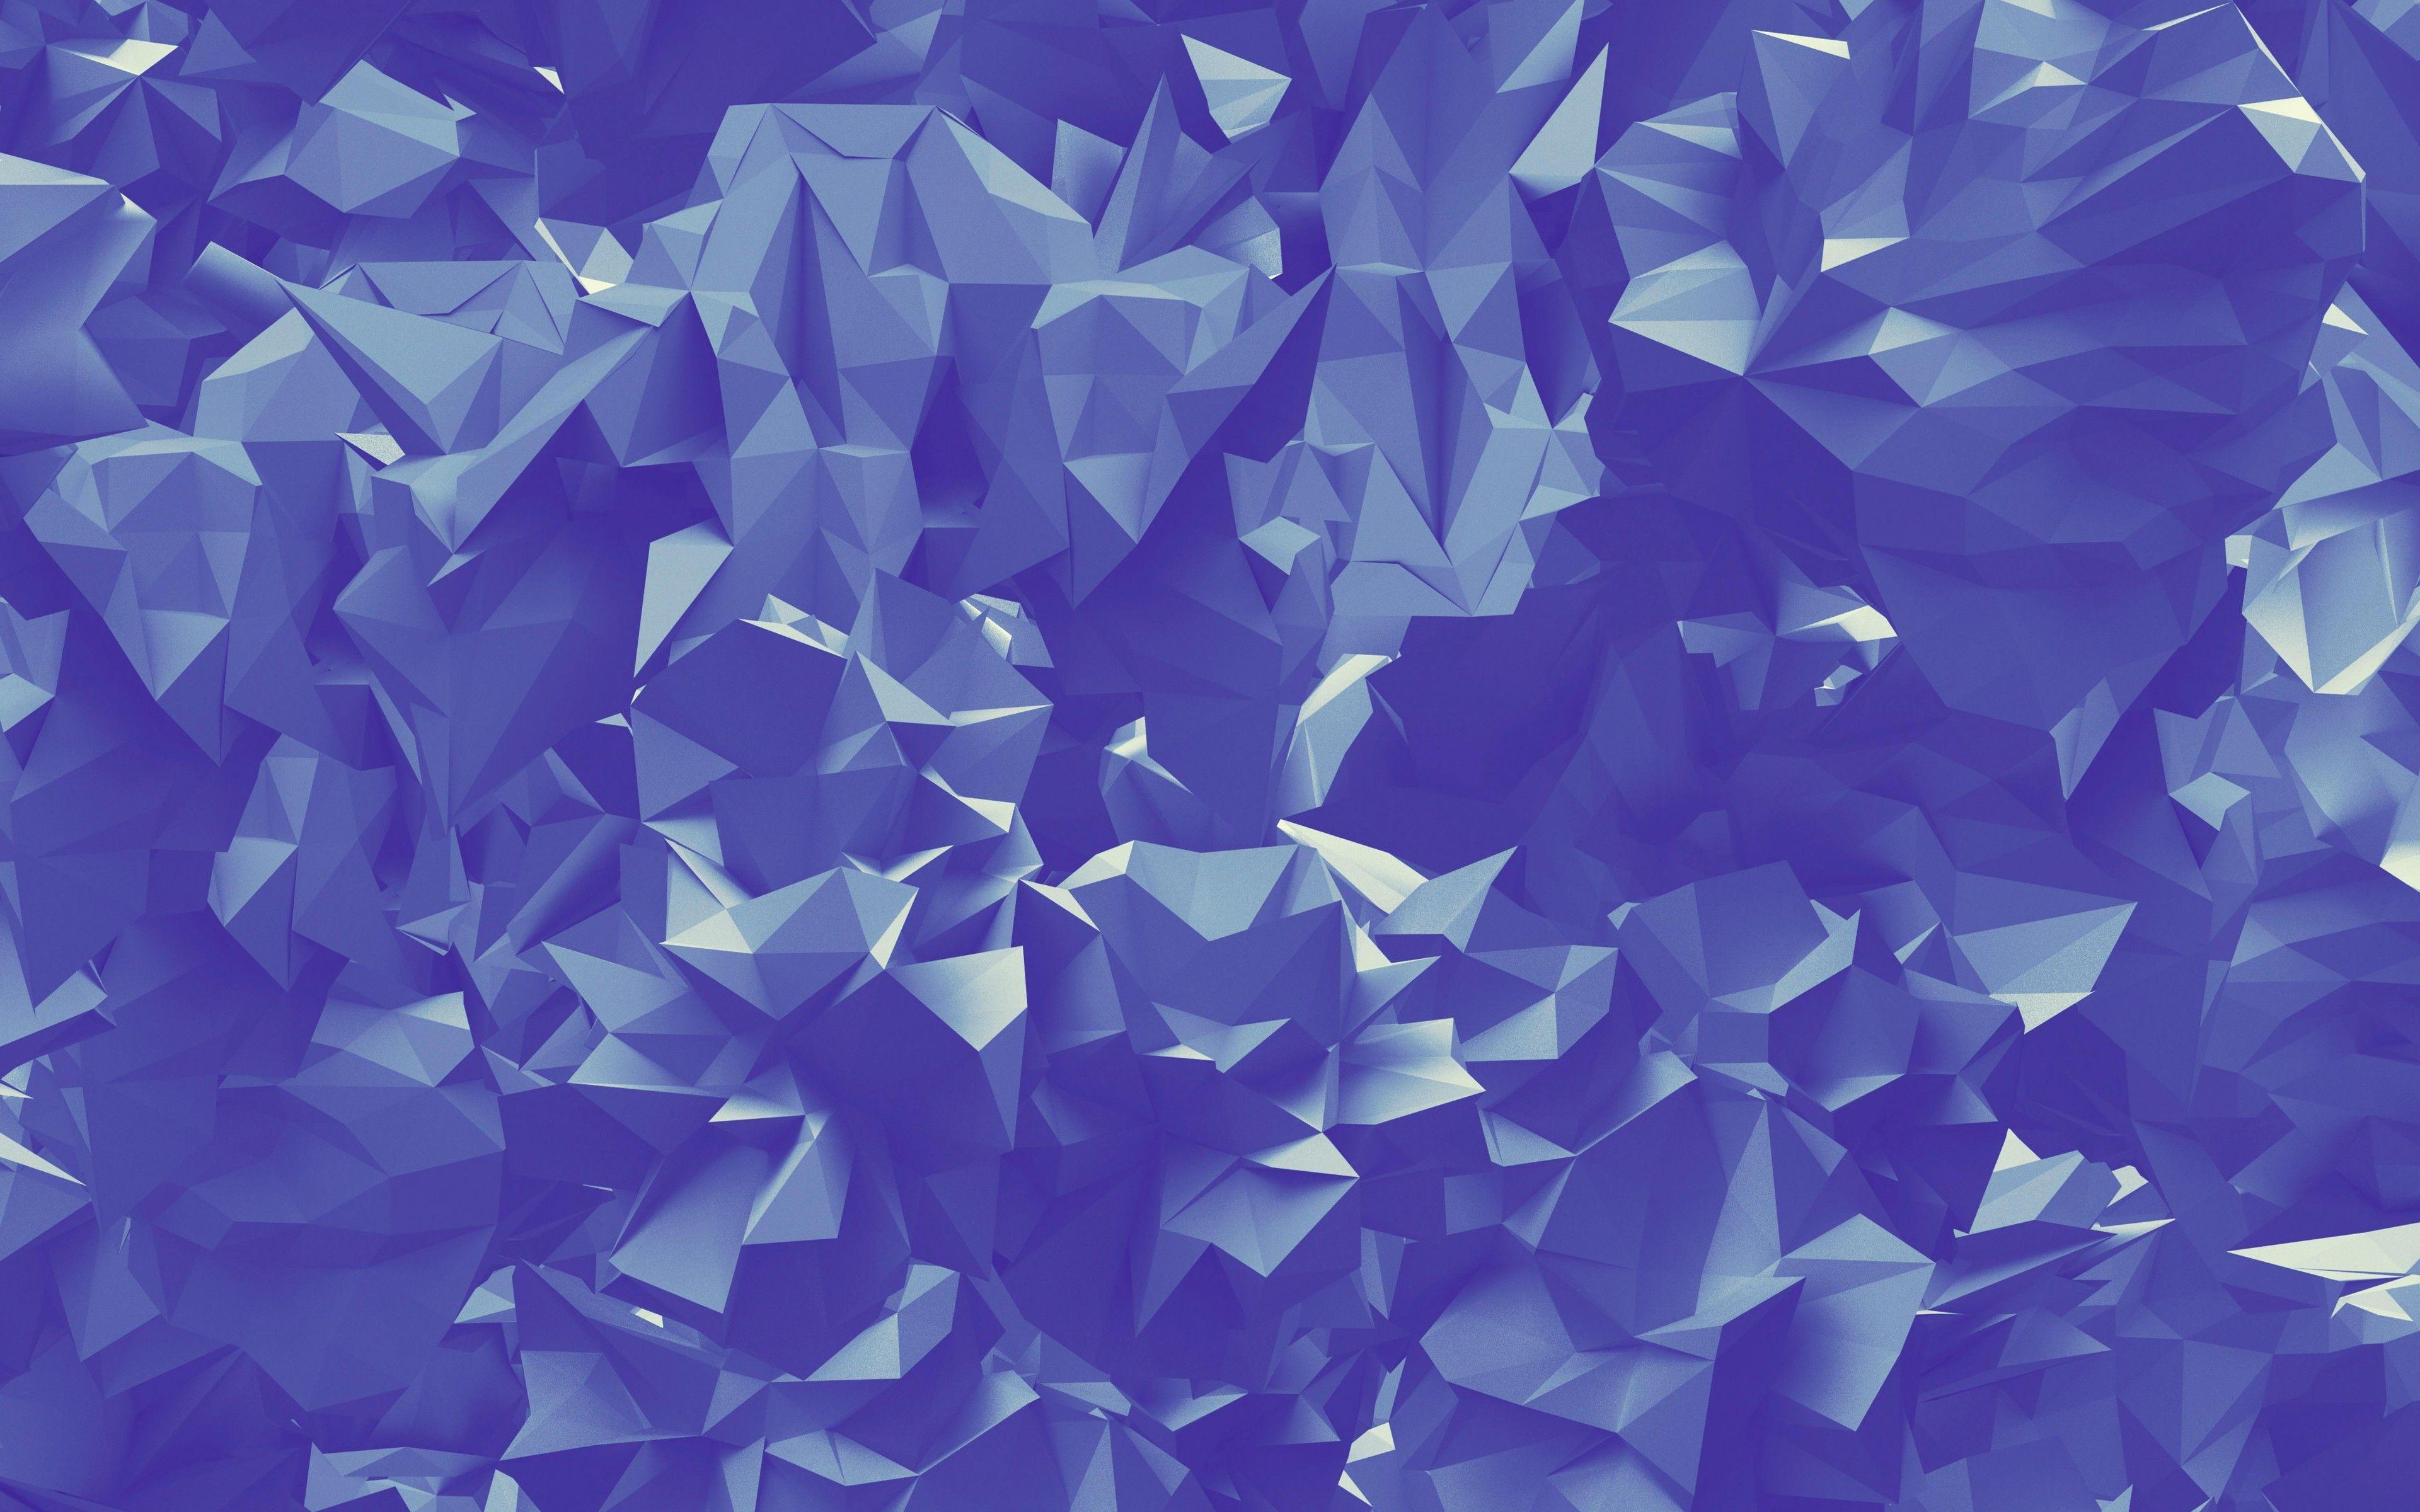 4k Triangles Fond Violet Creatif De La Geometrie Wallpaper Pink And Blue Violet Background Wallpaper